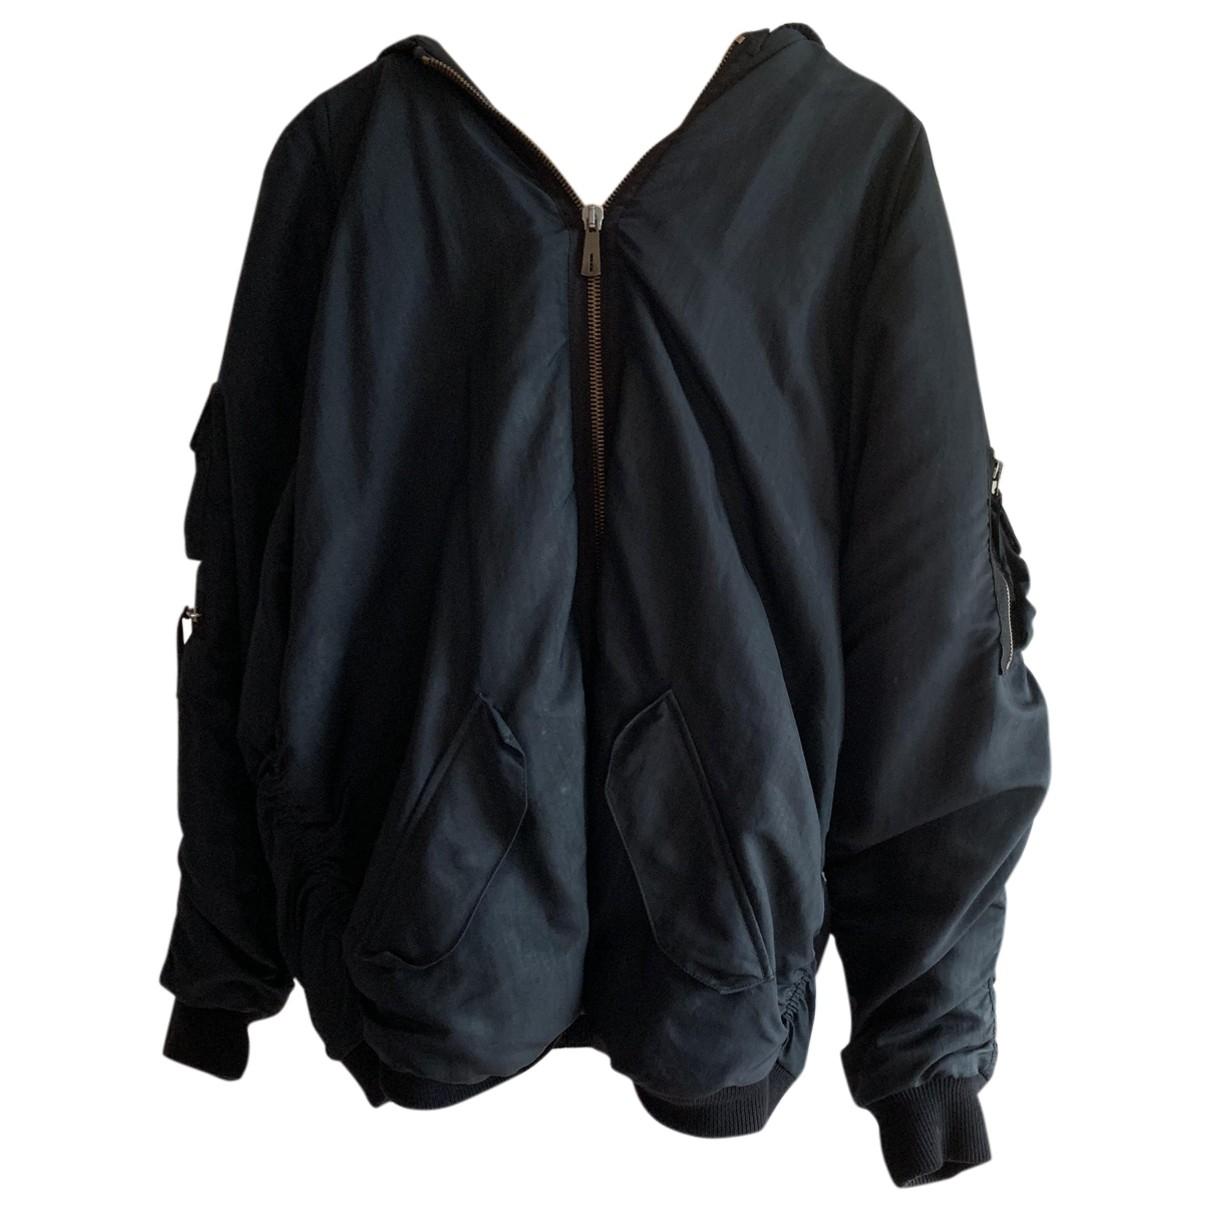 Acne Studios \N Blue jacket for Women 38 FR